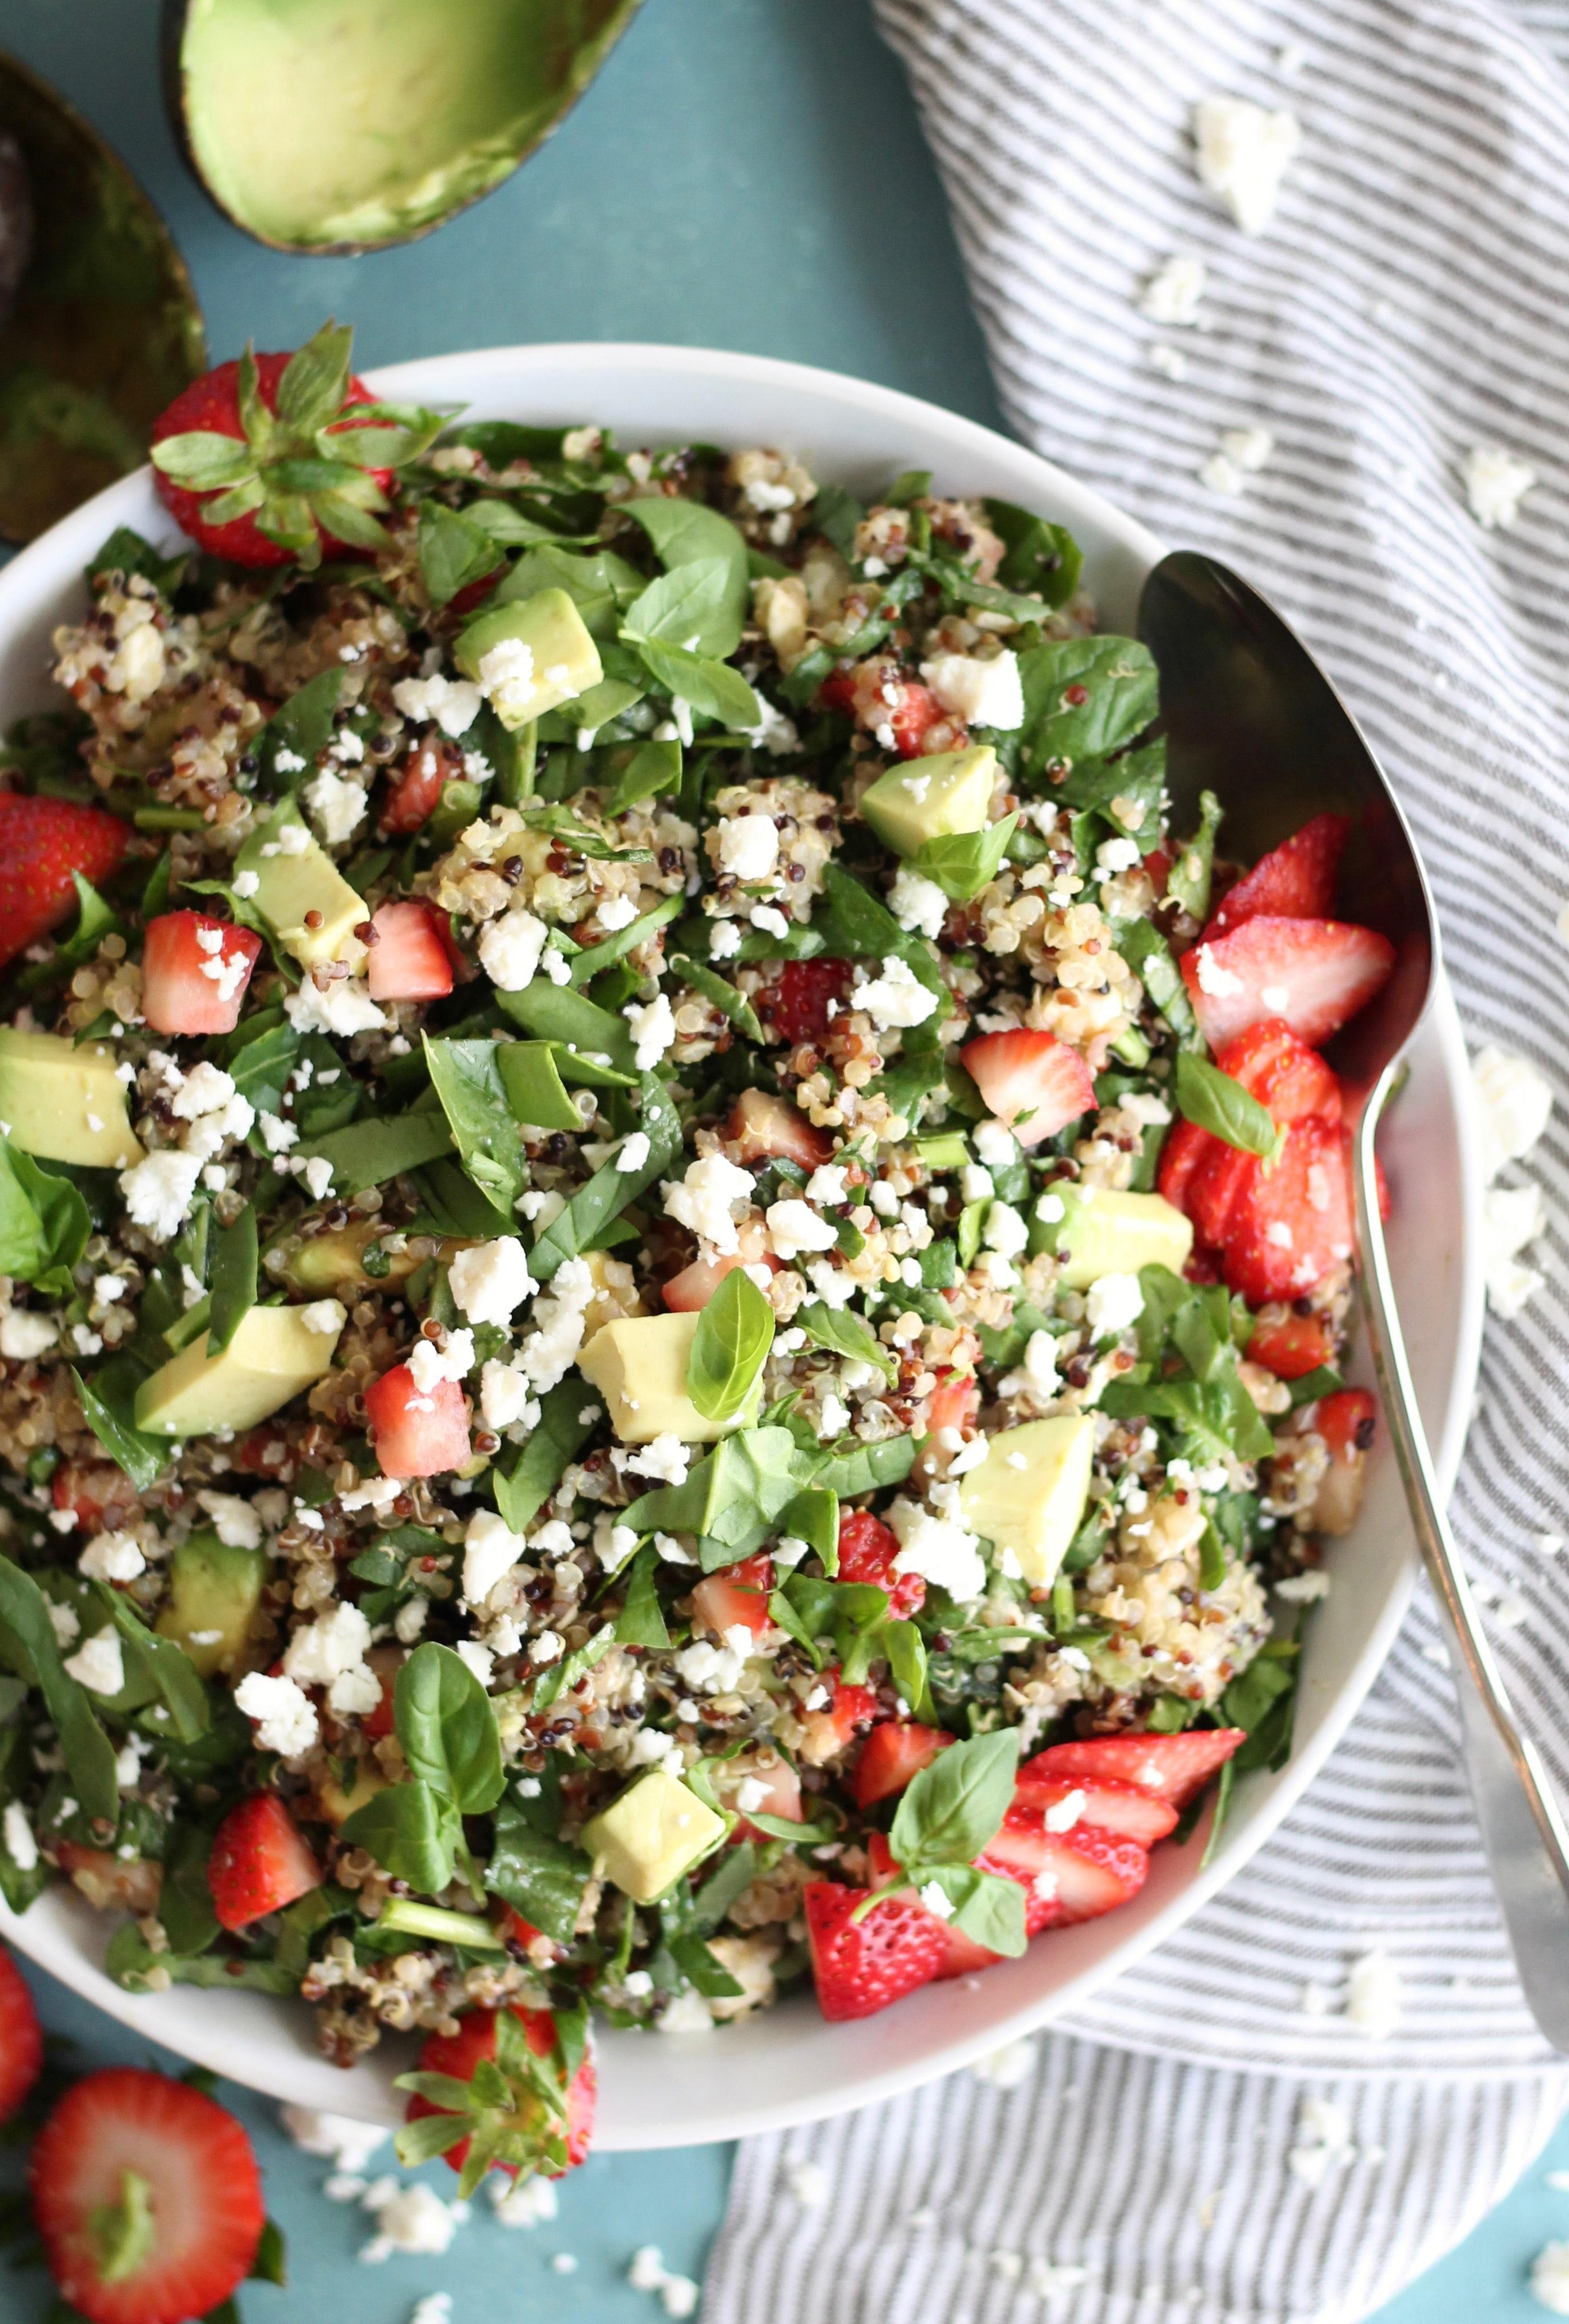 Strawberry Avocado Feta Spinach Quinoa Salad with Basil and Balsamic